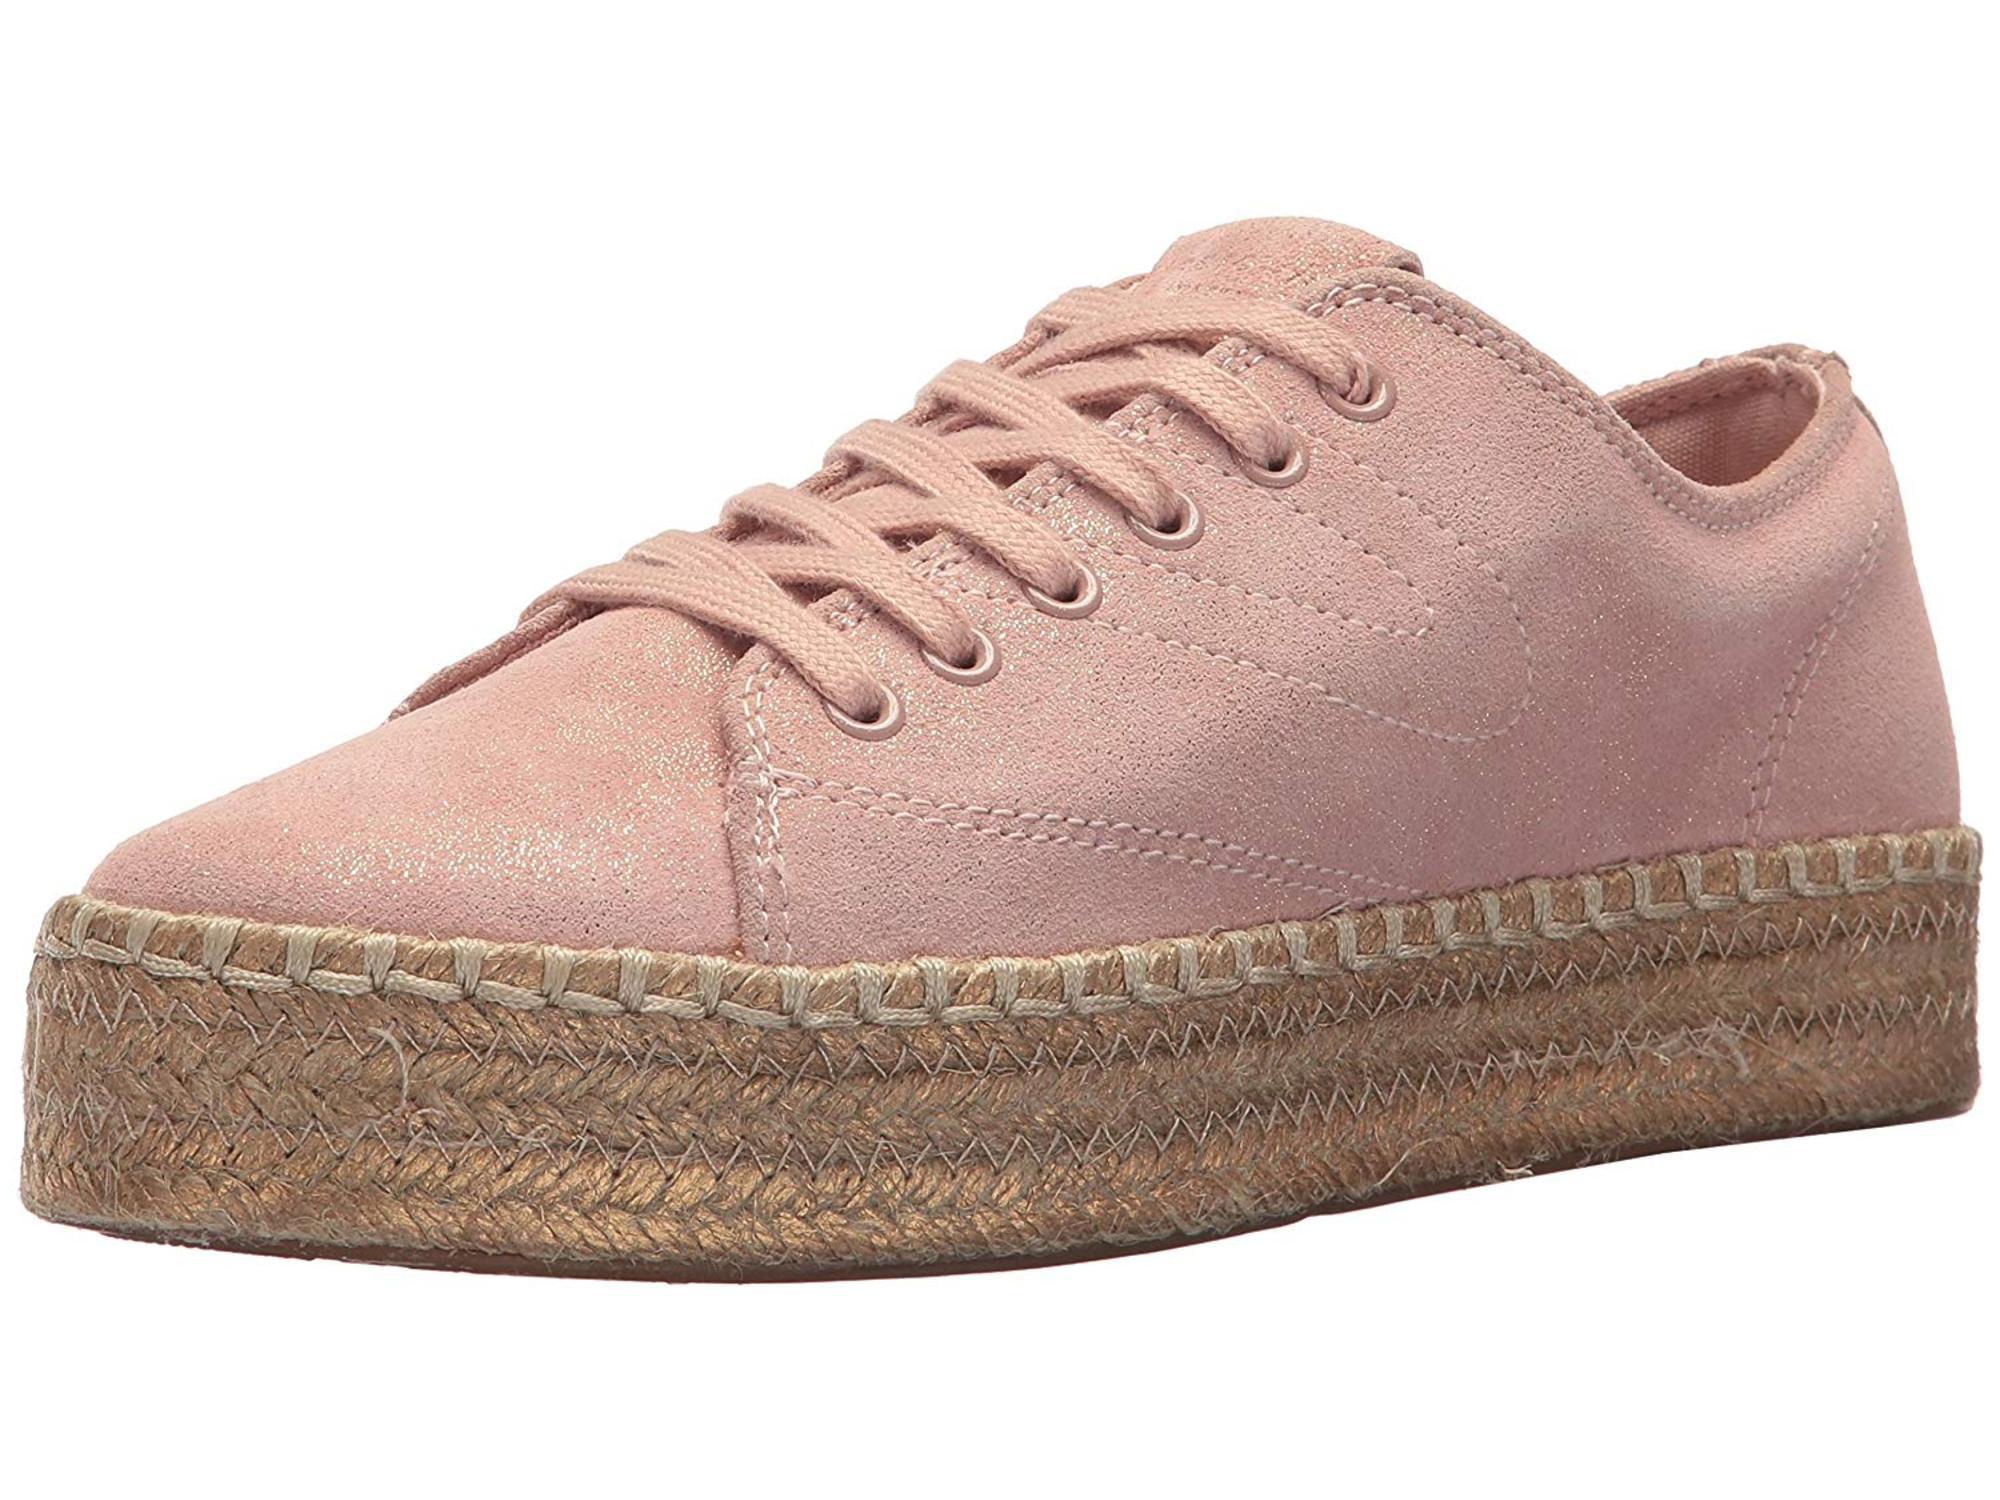 Tretorn Women's Eve2 Sneaker, Soft Blush, Size 6.5 by Tretorn